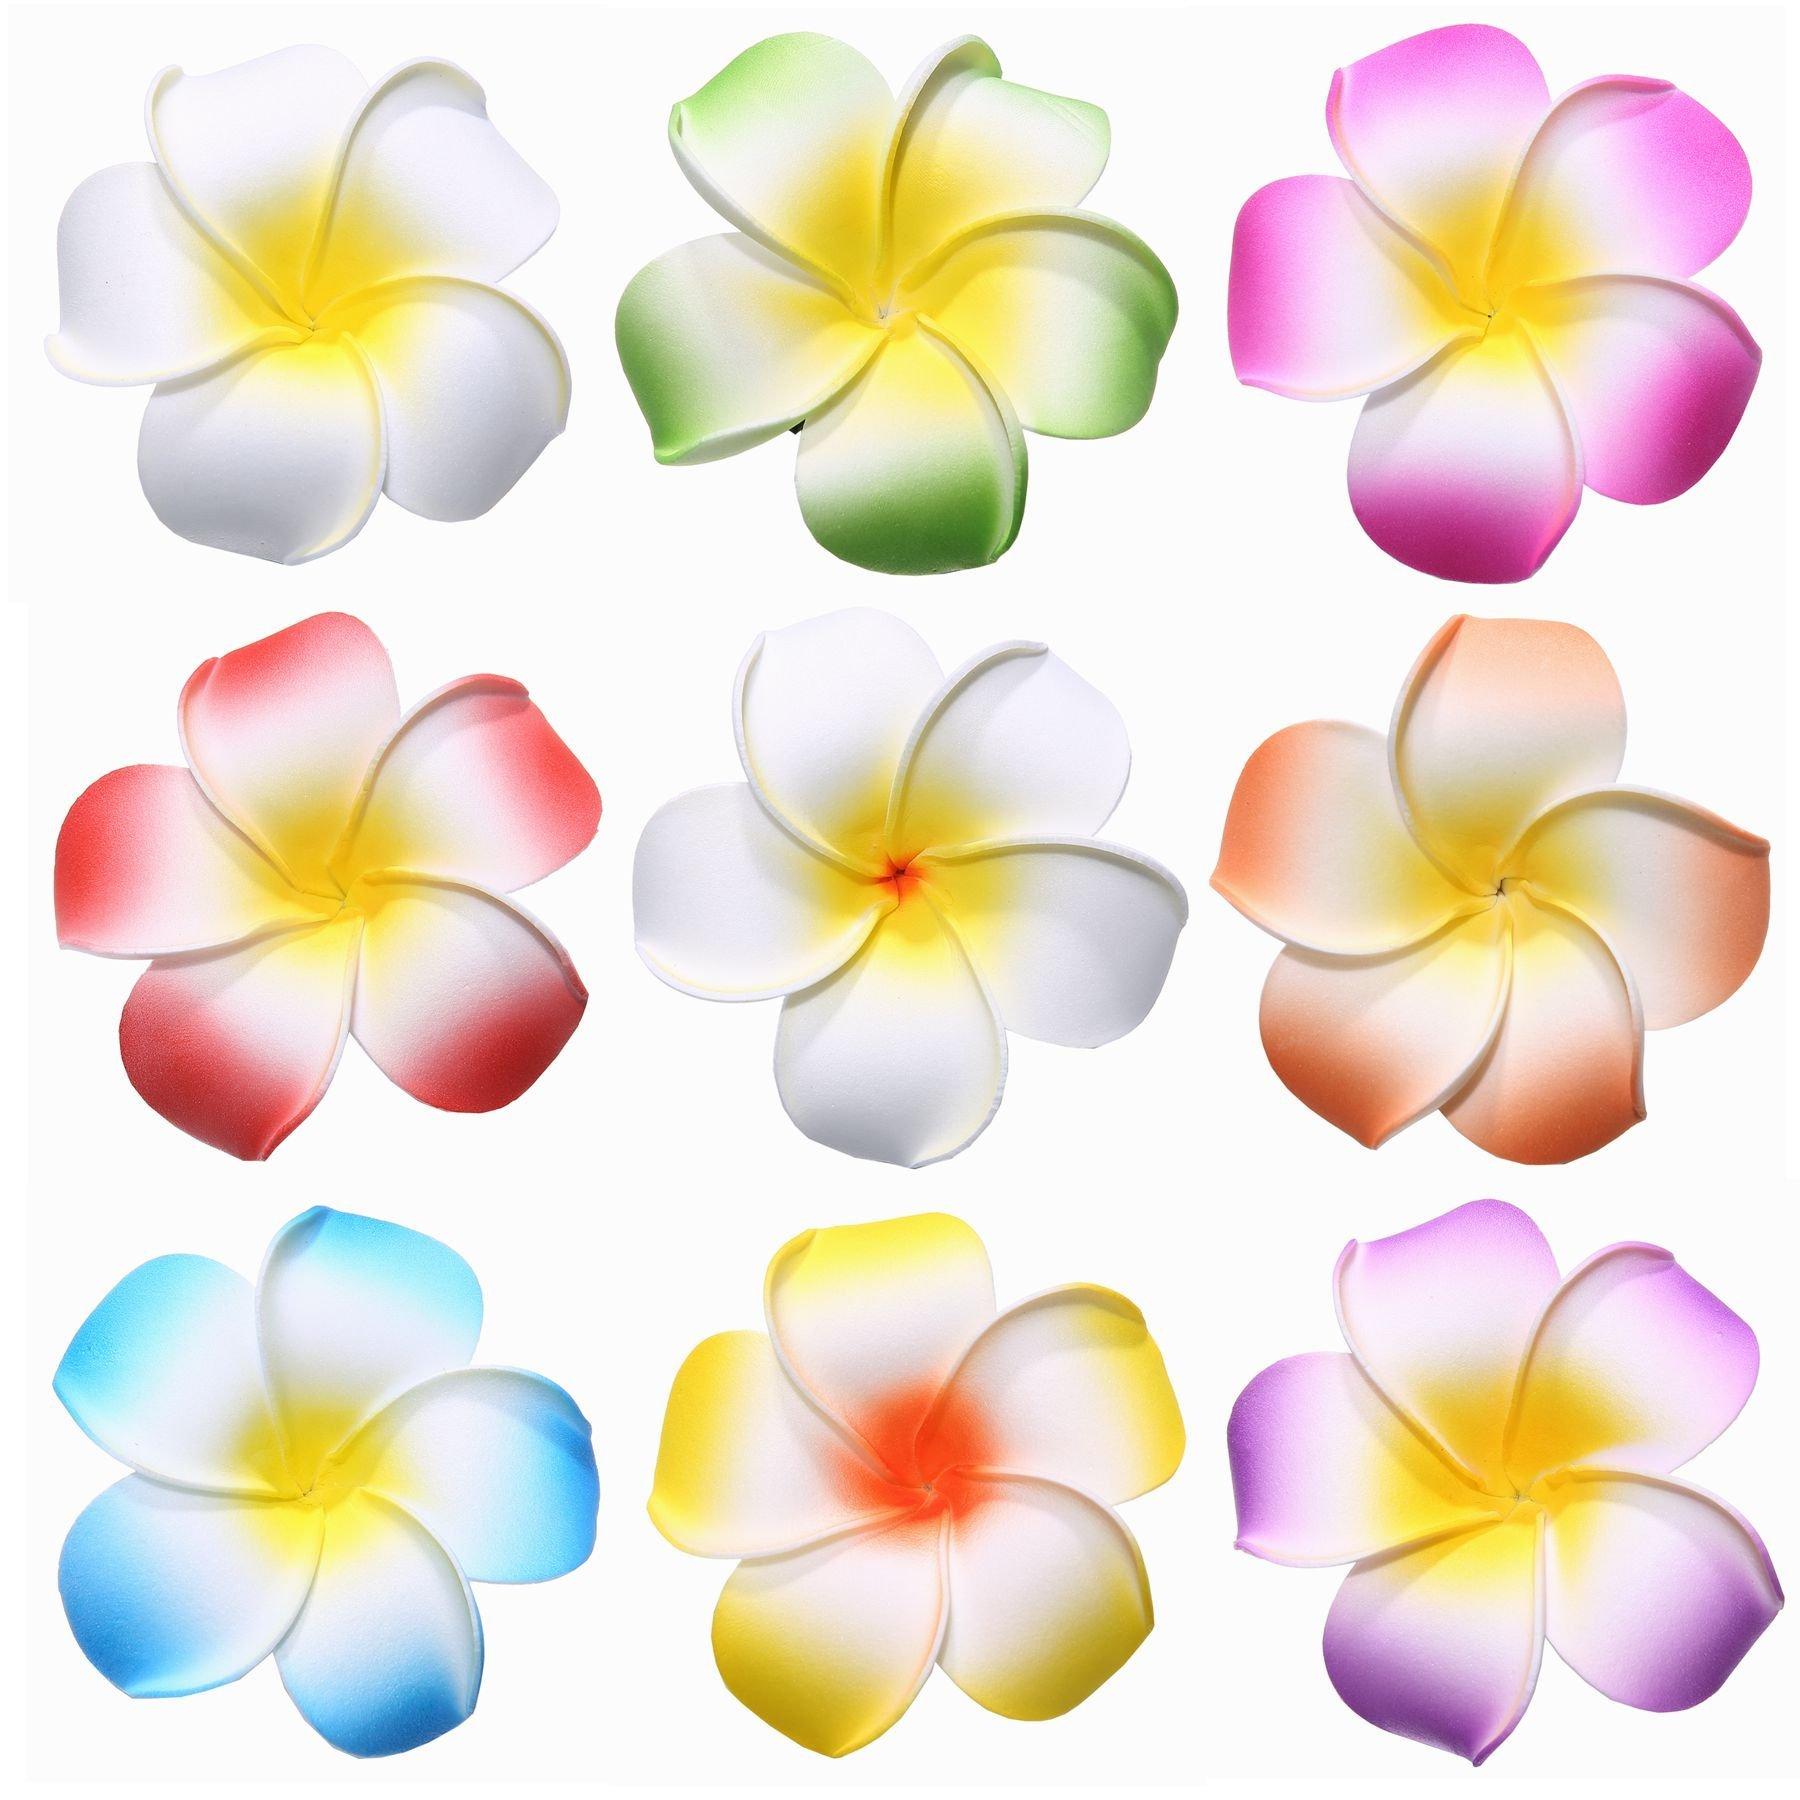 Best hawaiian flowers for hair amazon youbami 35 hawaiian plumeria foam flower hair clip accessory set of 9 pcs izmirmasajfo